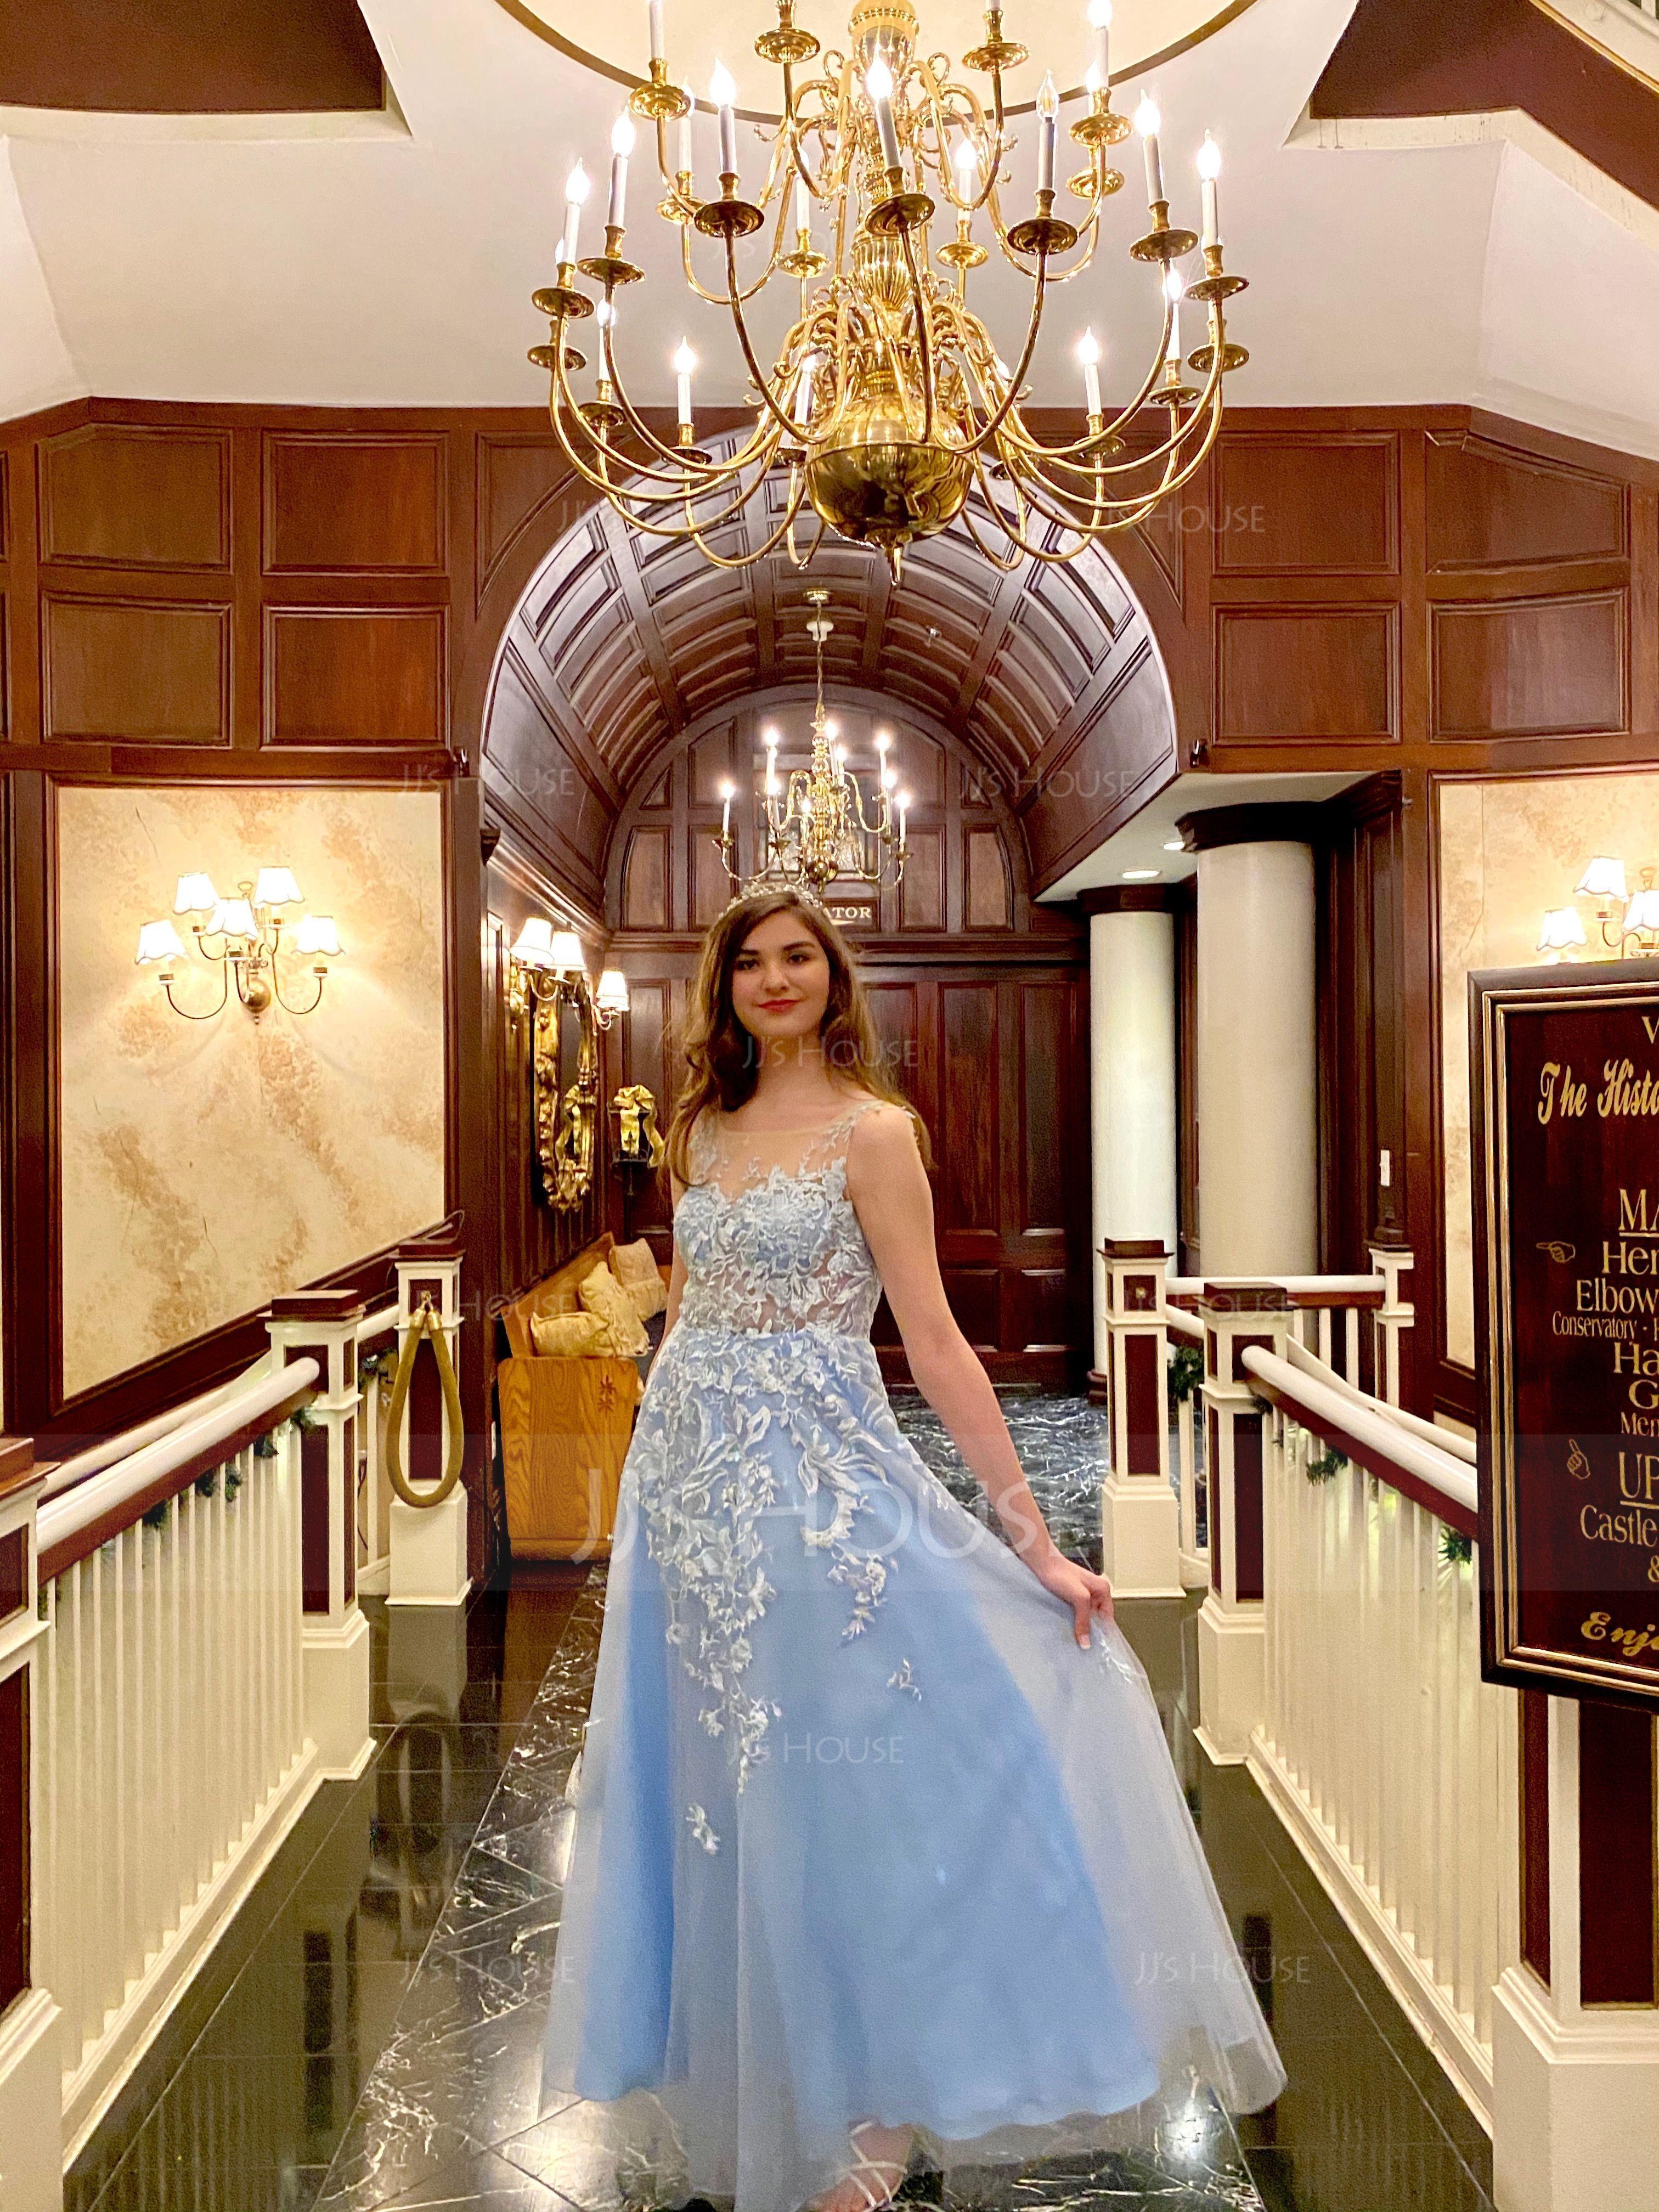 A-Line/Princess Scoop Neck Floor-Length Tulle Prom Dresses (018186891)